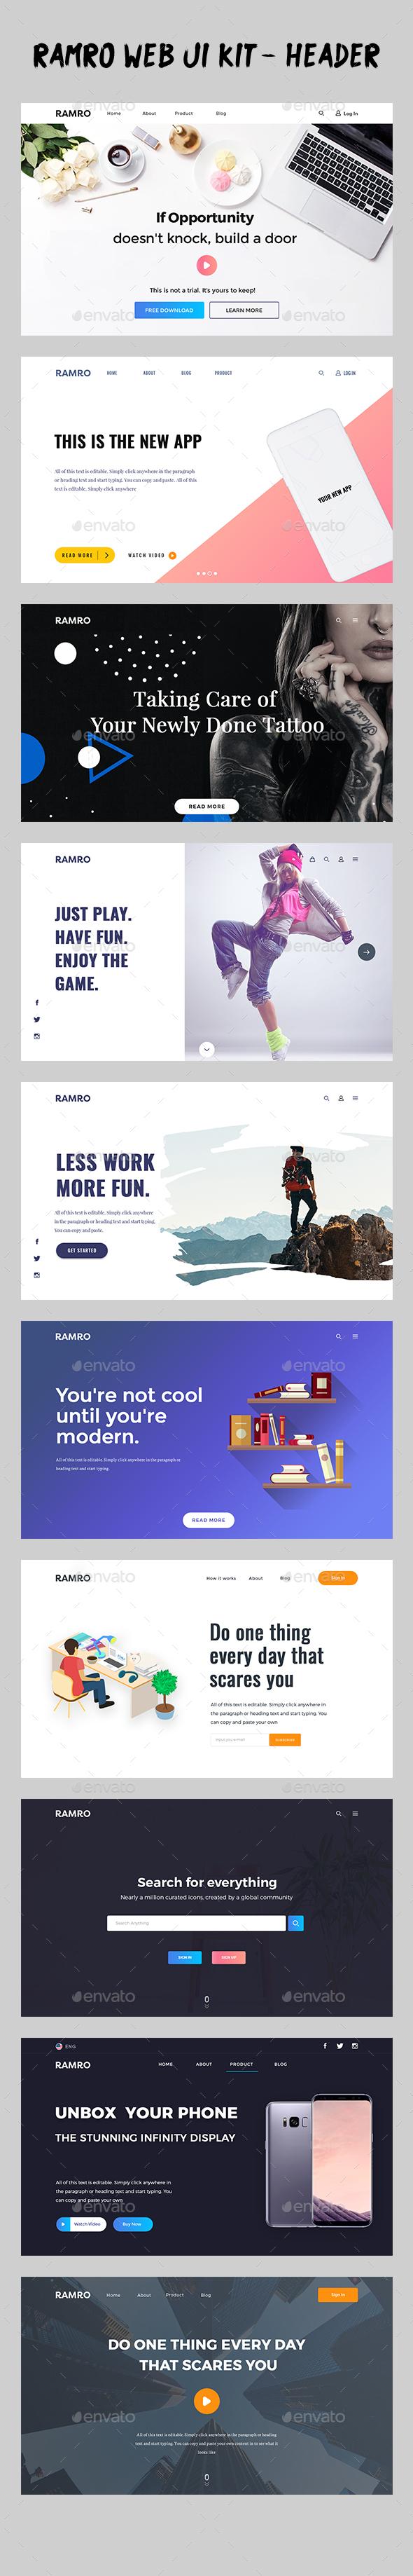 GraphicRiver Ramro Web UI Kit Header 19907959